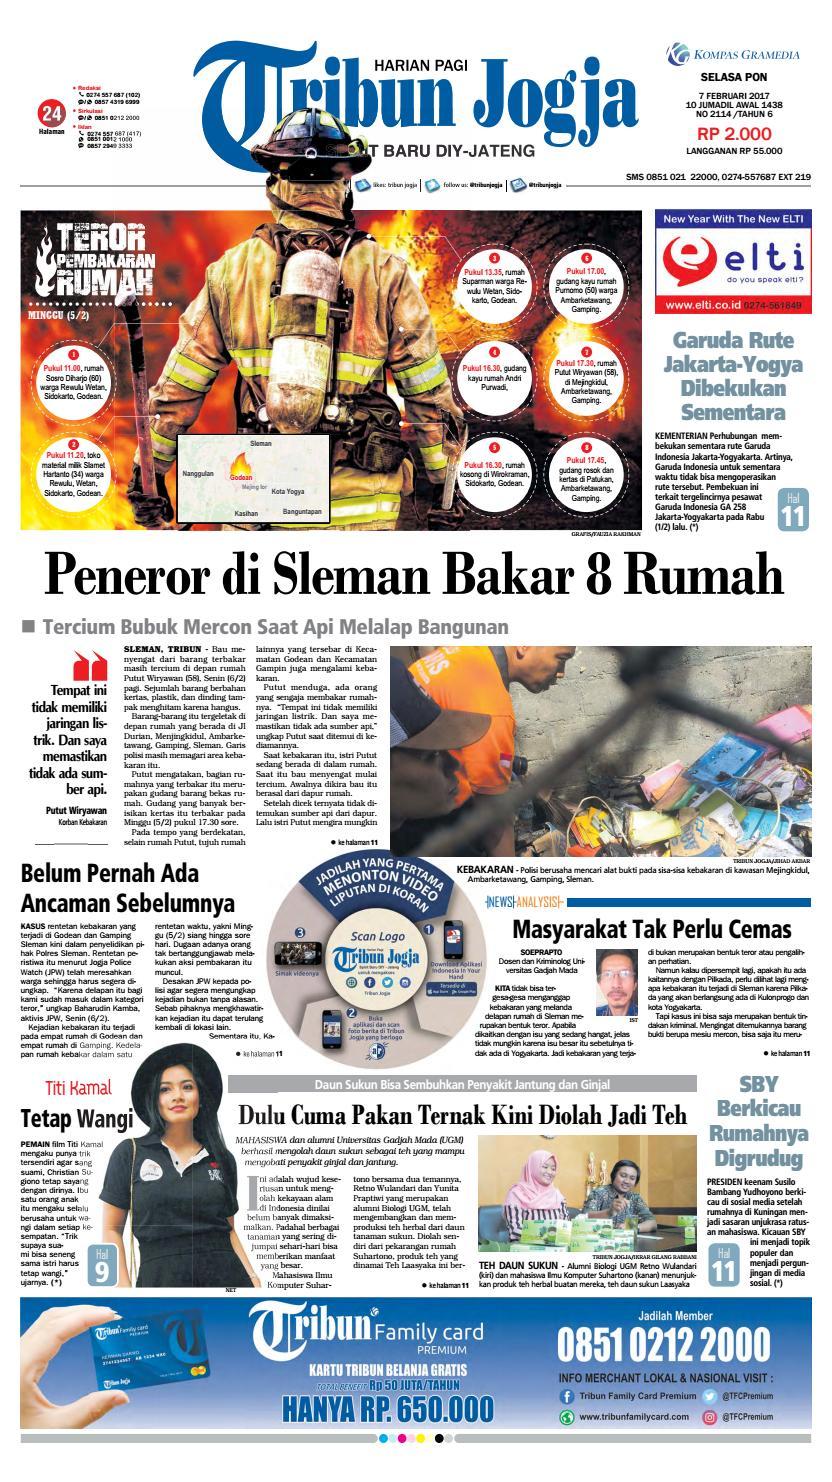 Tribunjogja 07 02 2017 By Tribun Jogja Issuu Produk Ukm Bumn Bunge Tanjung Betabur